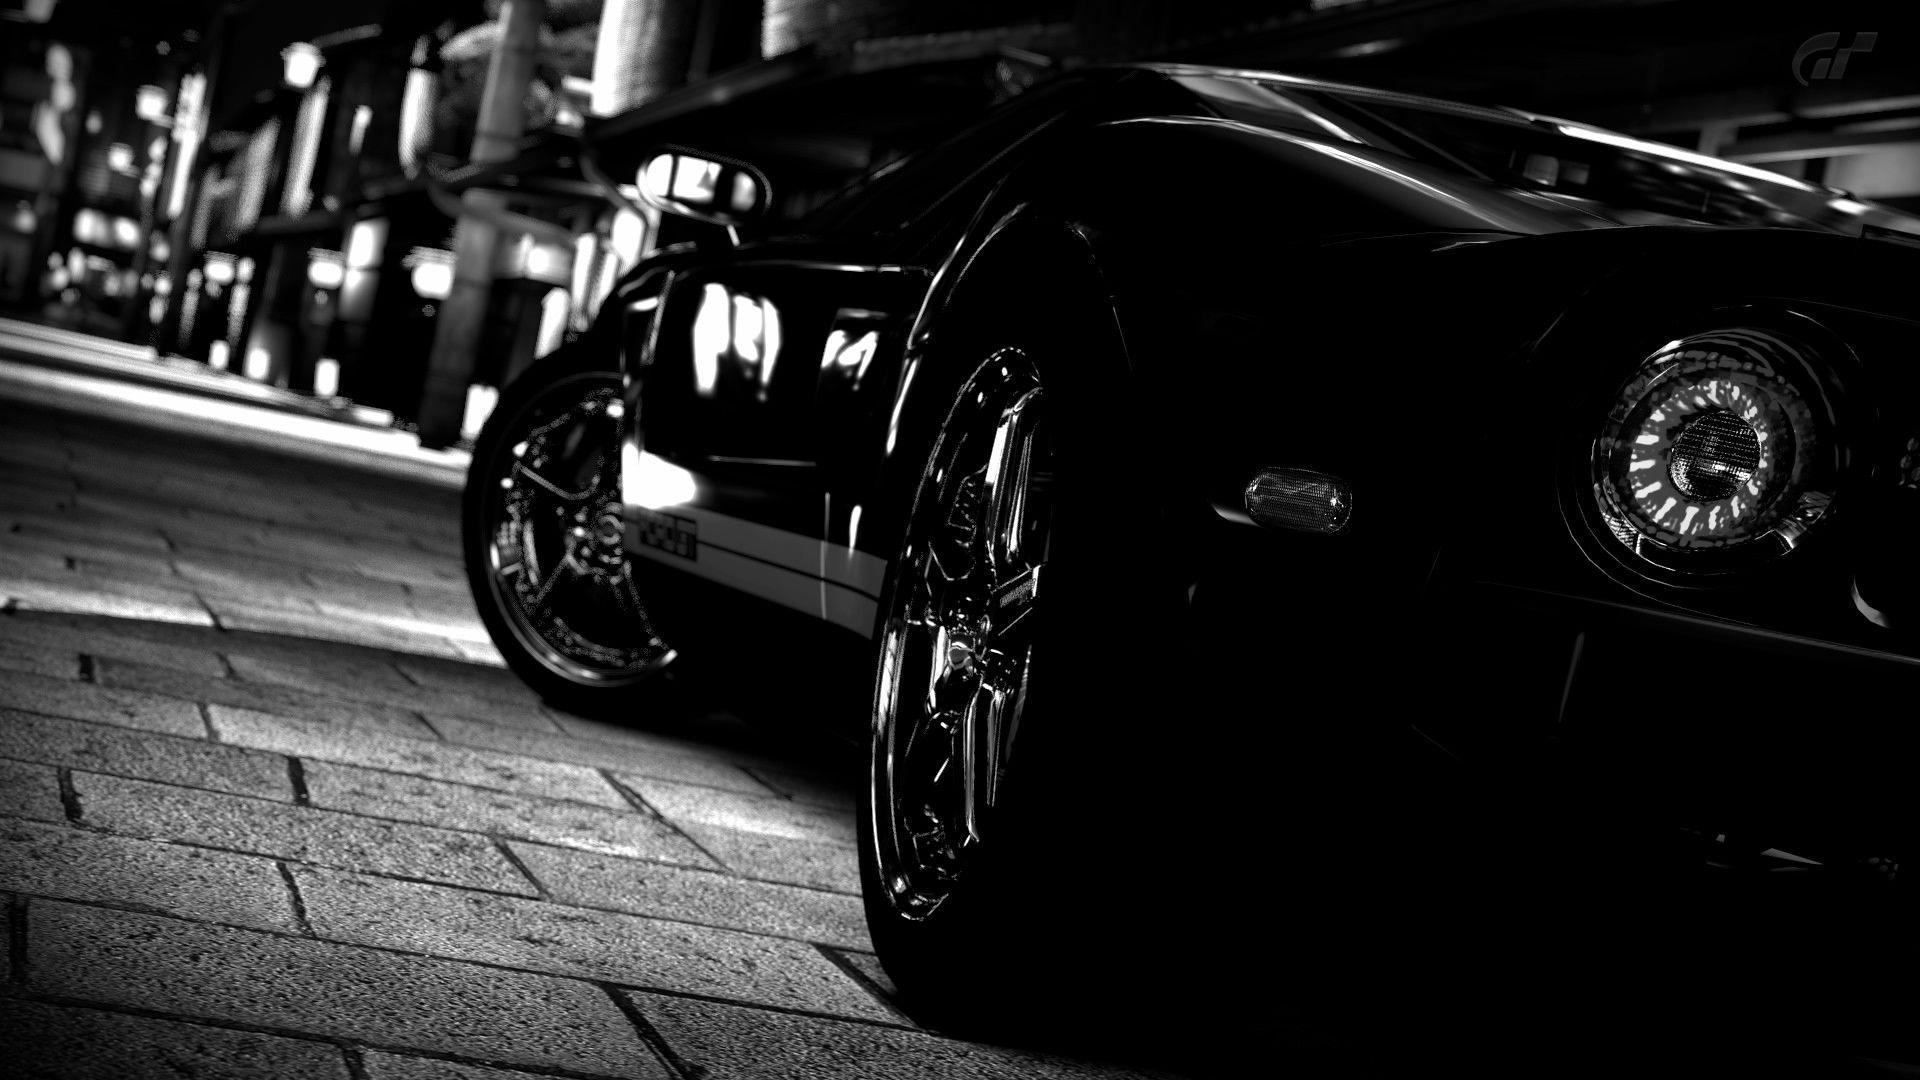 4k pure black wallpaper …. Black And White Car Wallpapers Top Free Black And White Car Backgrounds Wallpaperaccess